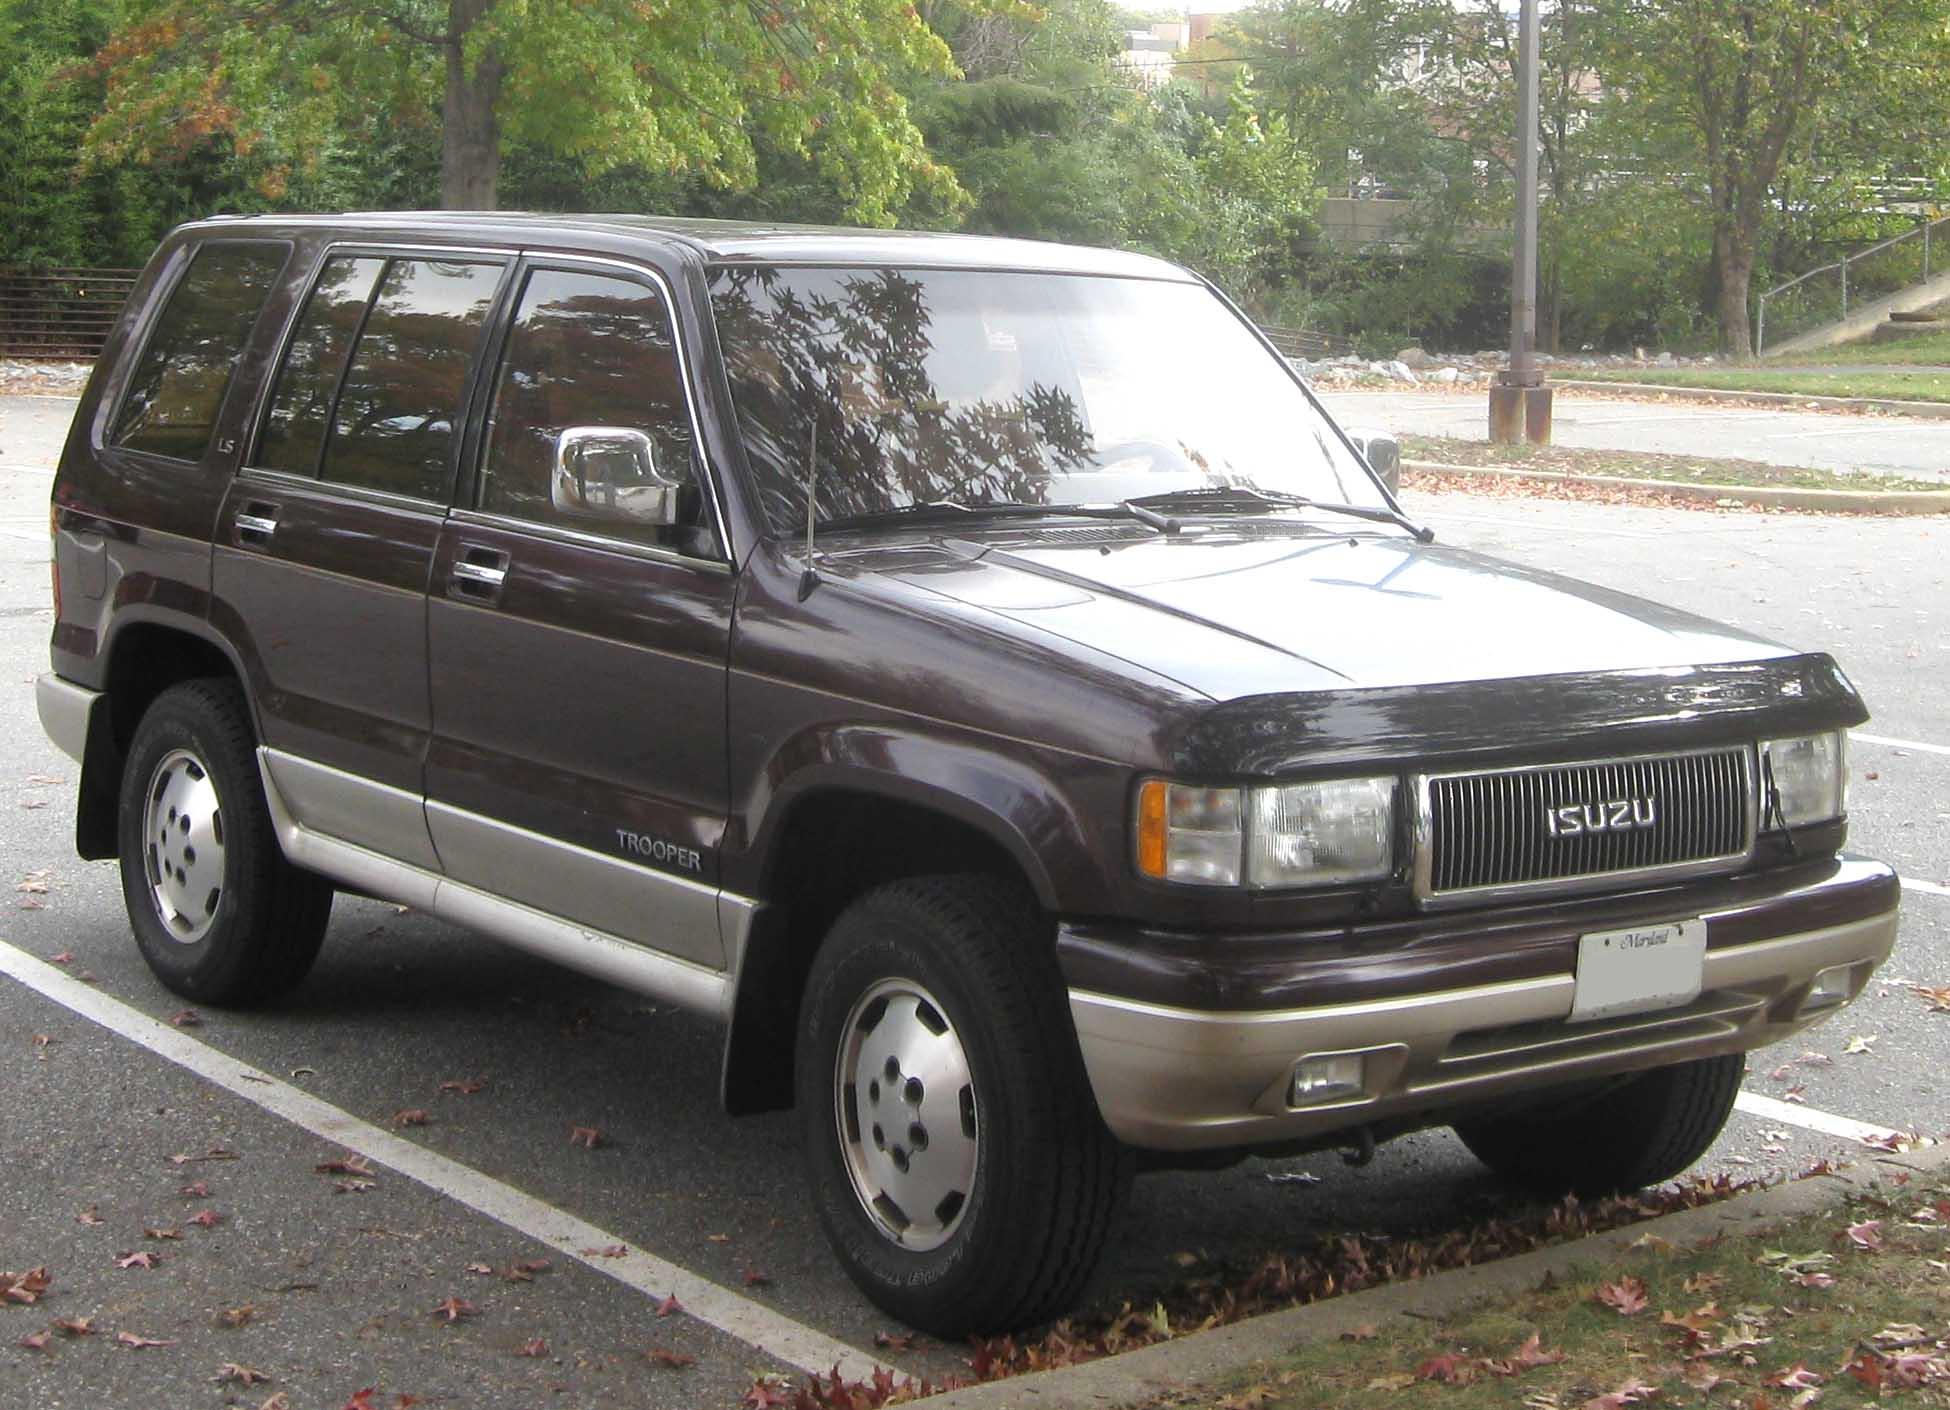 1997 Acura SLX #6 Acura SLX #6